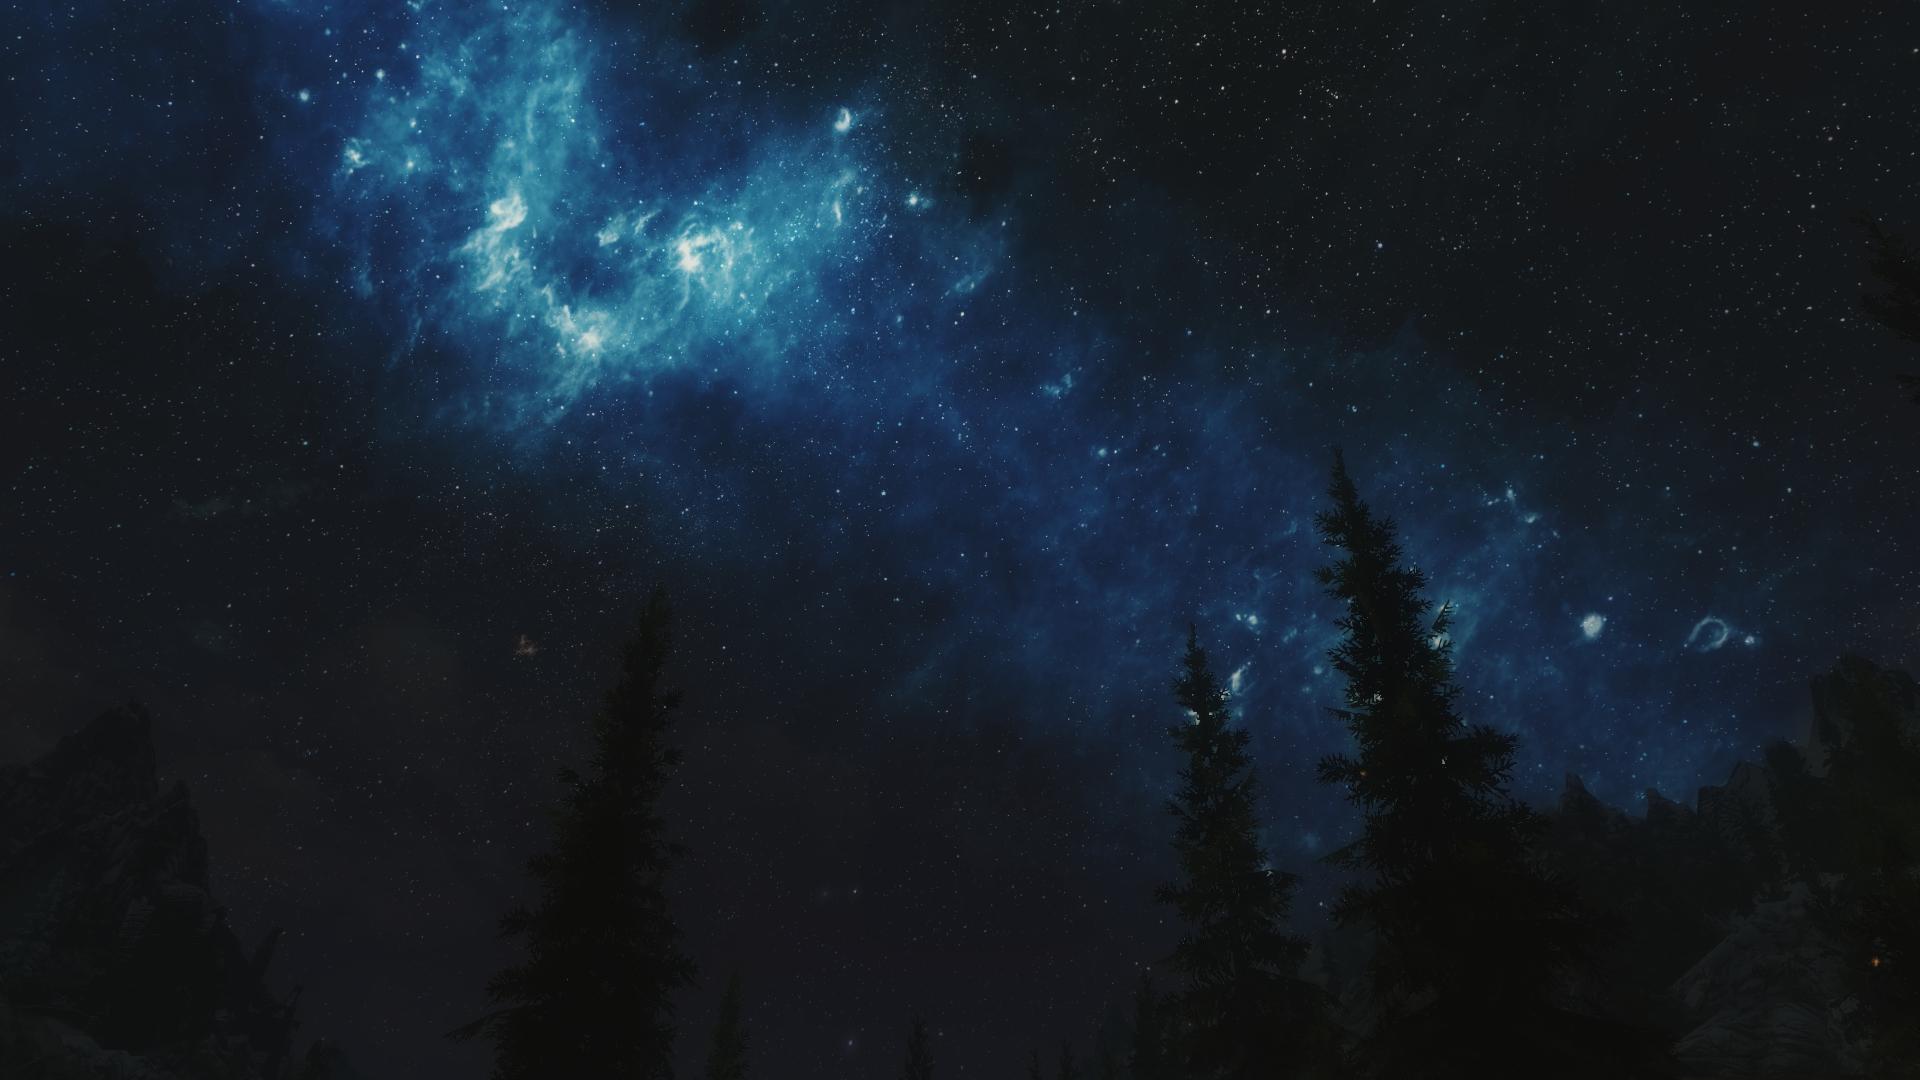 Night Sky wallpaper   1070656 1920x1080